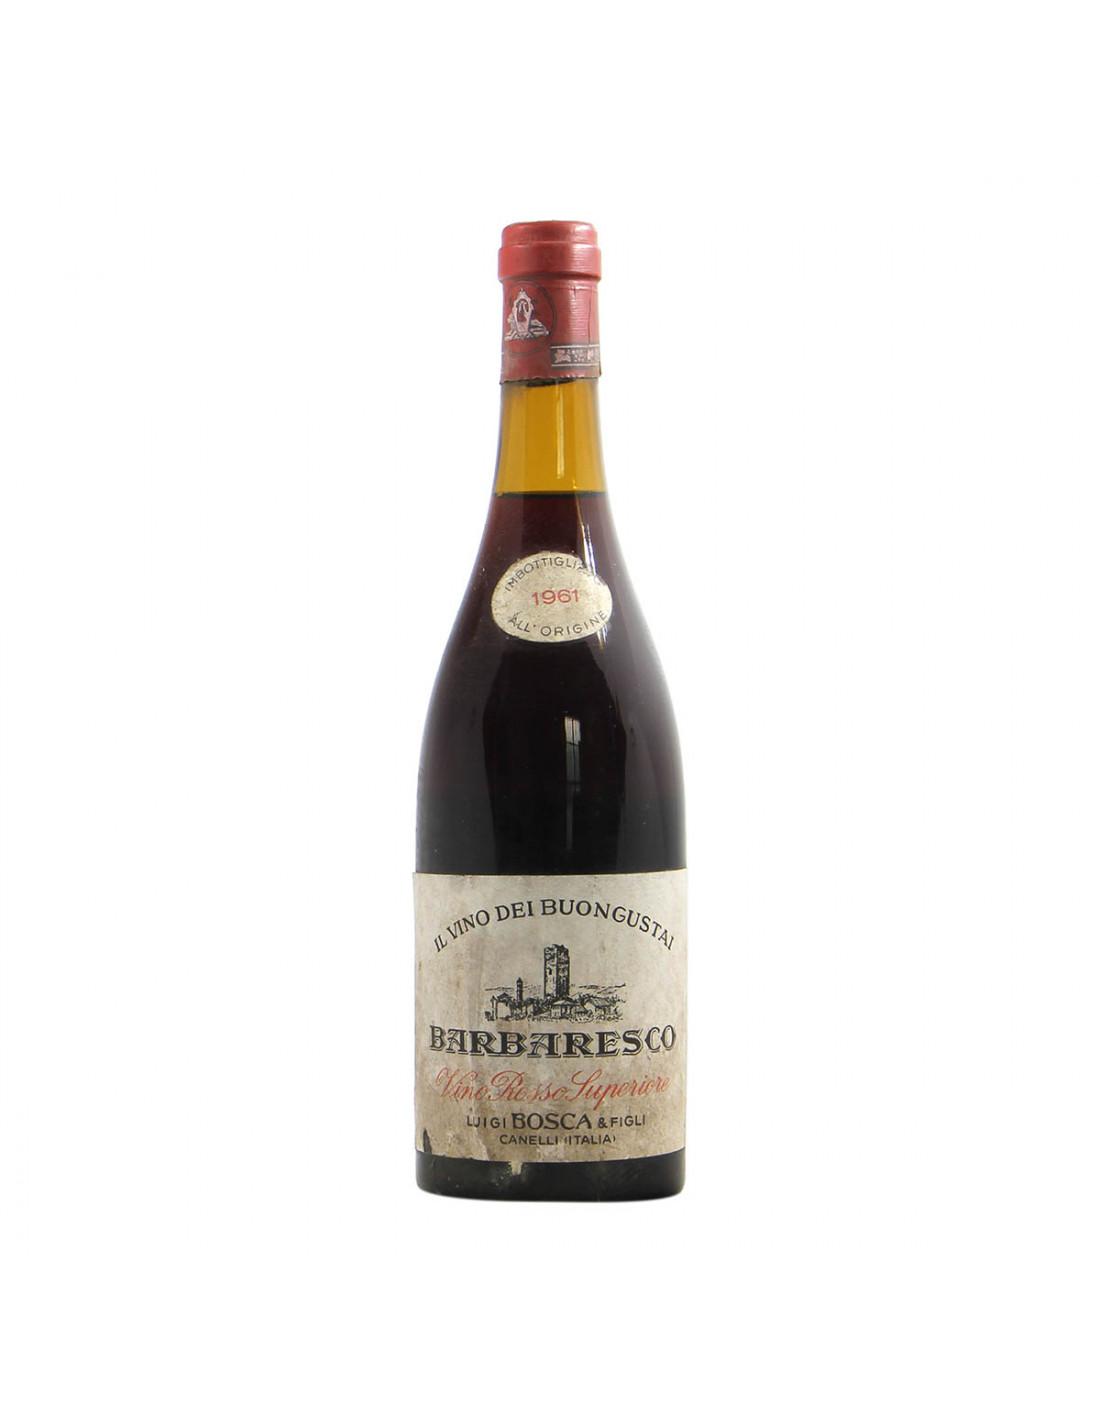 Bosca Barbaresco 1961 Grandi Bottiglie